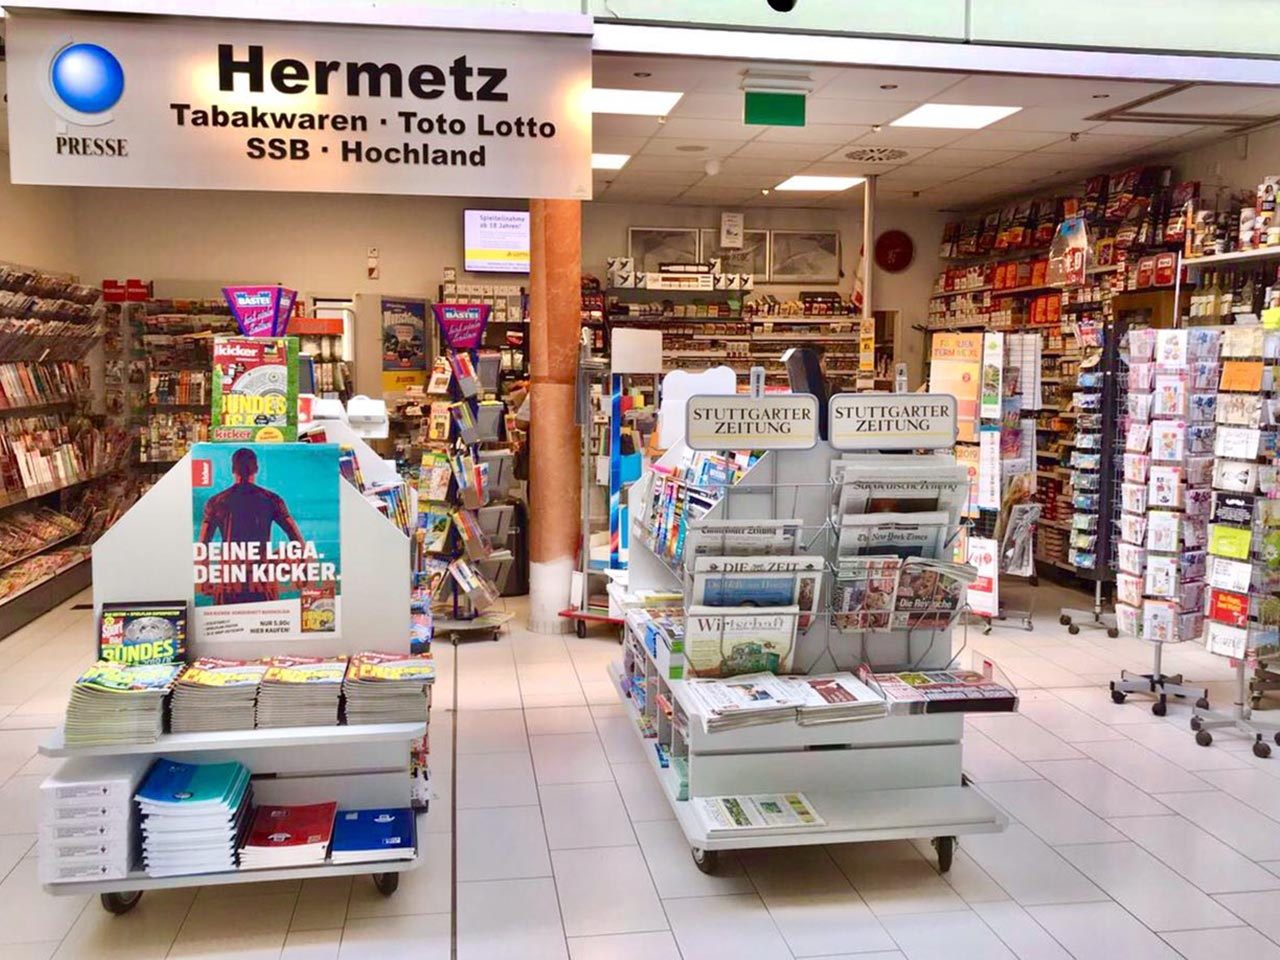 Hermetz - Tabakwaren, Toto-Lotto, SSB, Weine, Presse u.m.